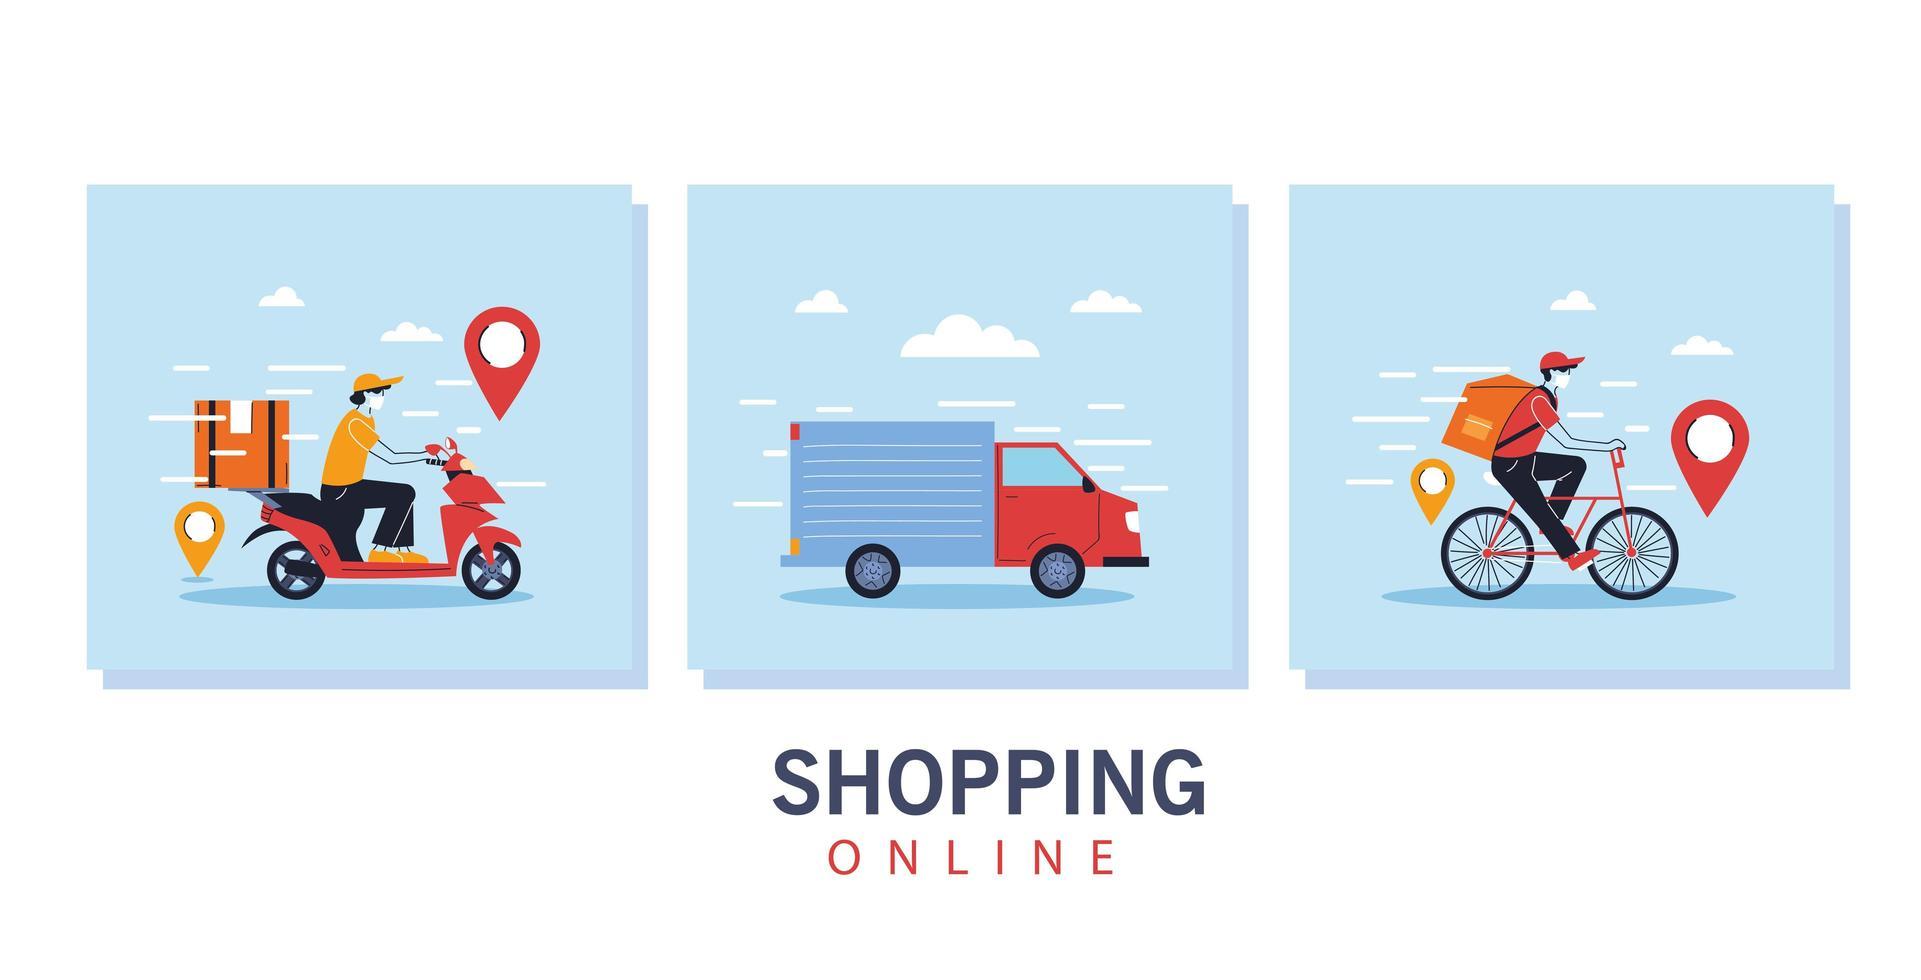 Delivery, service, transportation and logistics scene set vector